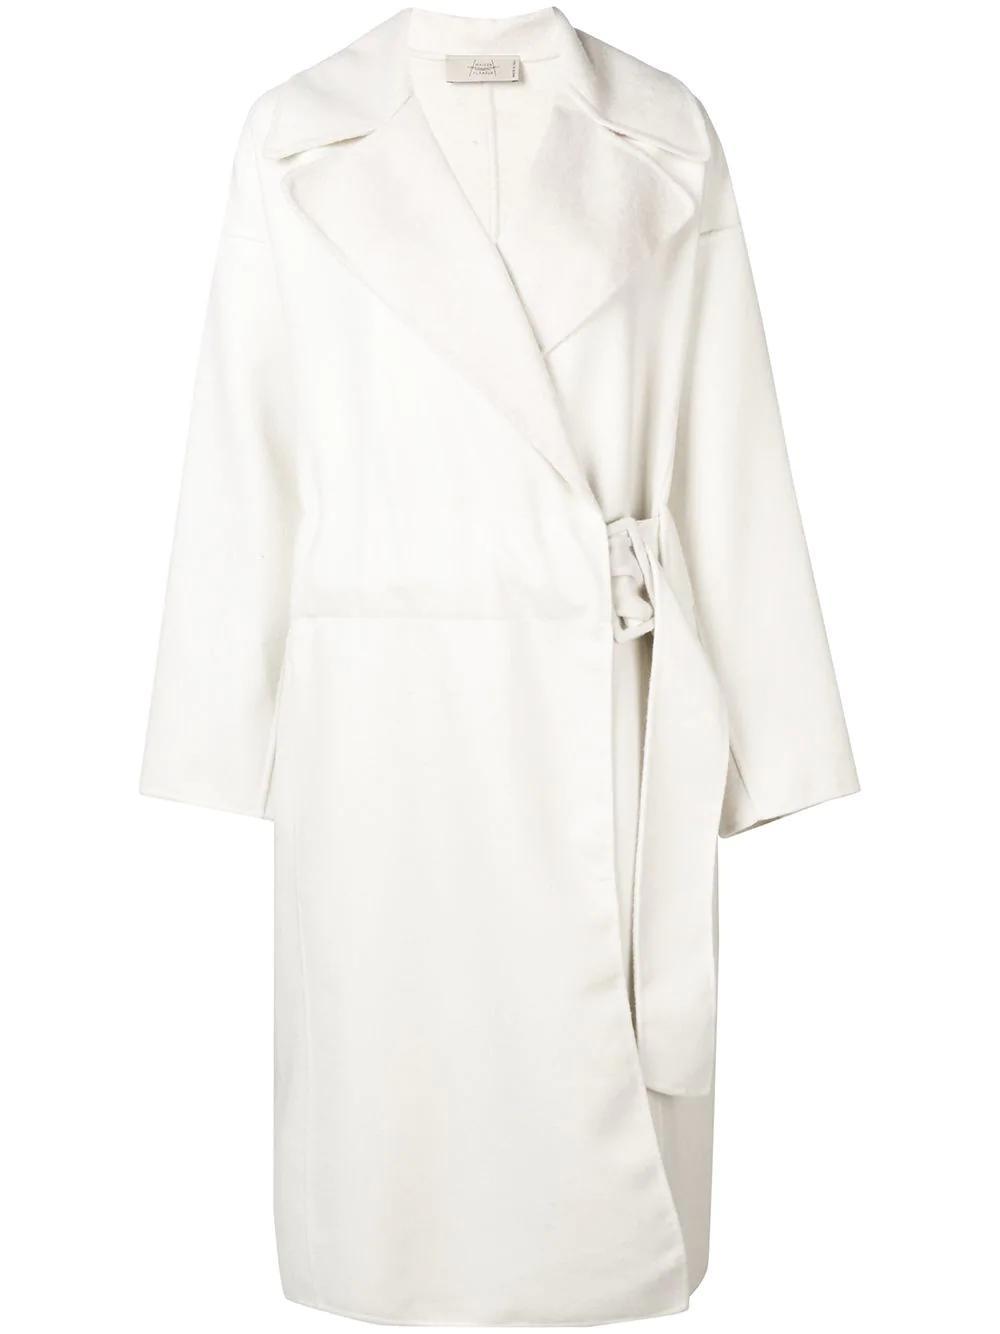 Maison Flaneur Oversized Belted Coat - White